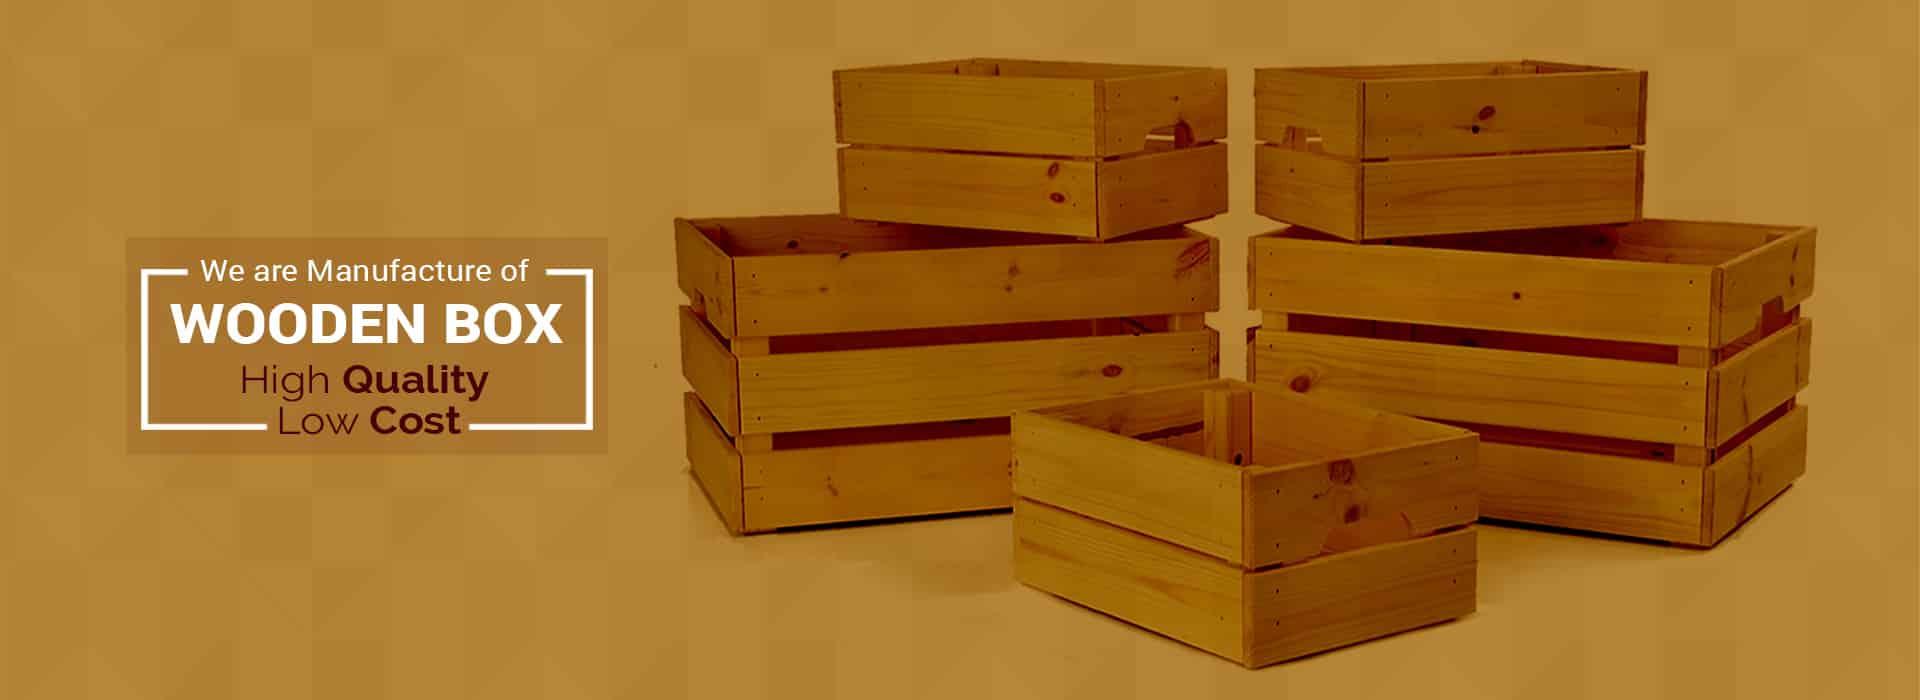 Wooden Box in Ahmedabad, Surat, vadodara, Rajkot, Gandhinagar, Jamnagar, Bharuch, Anand, Ankleshwar